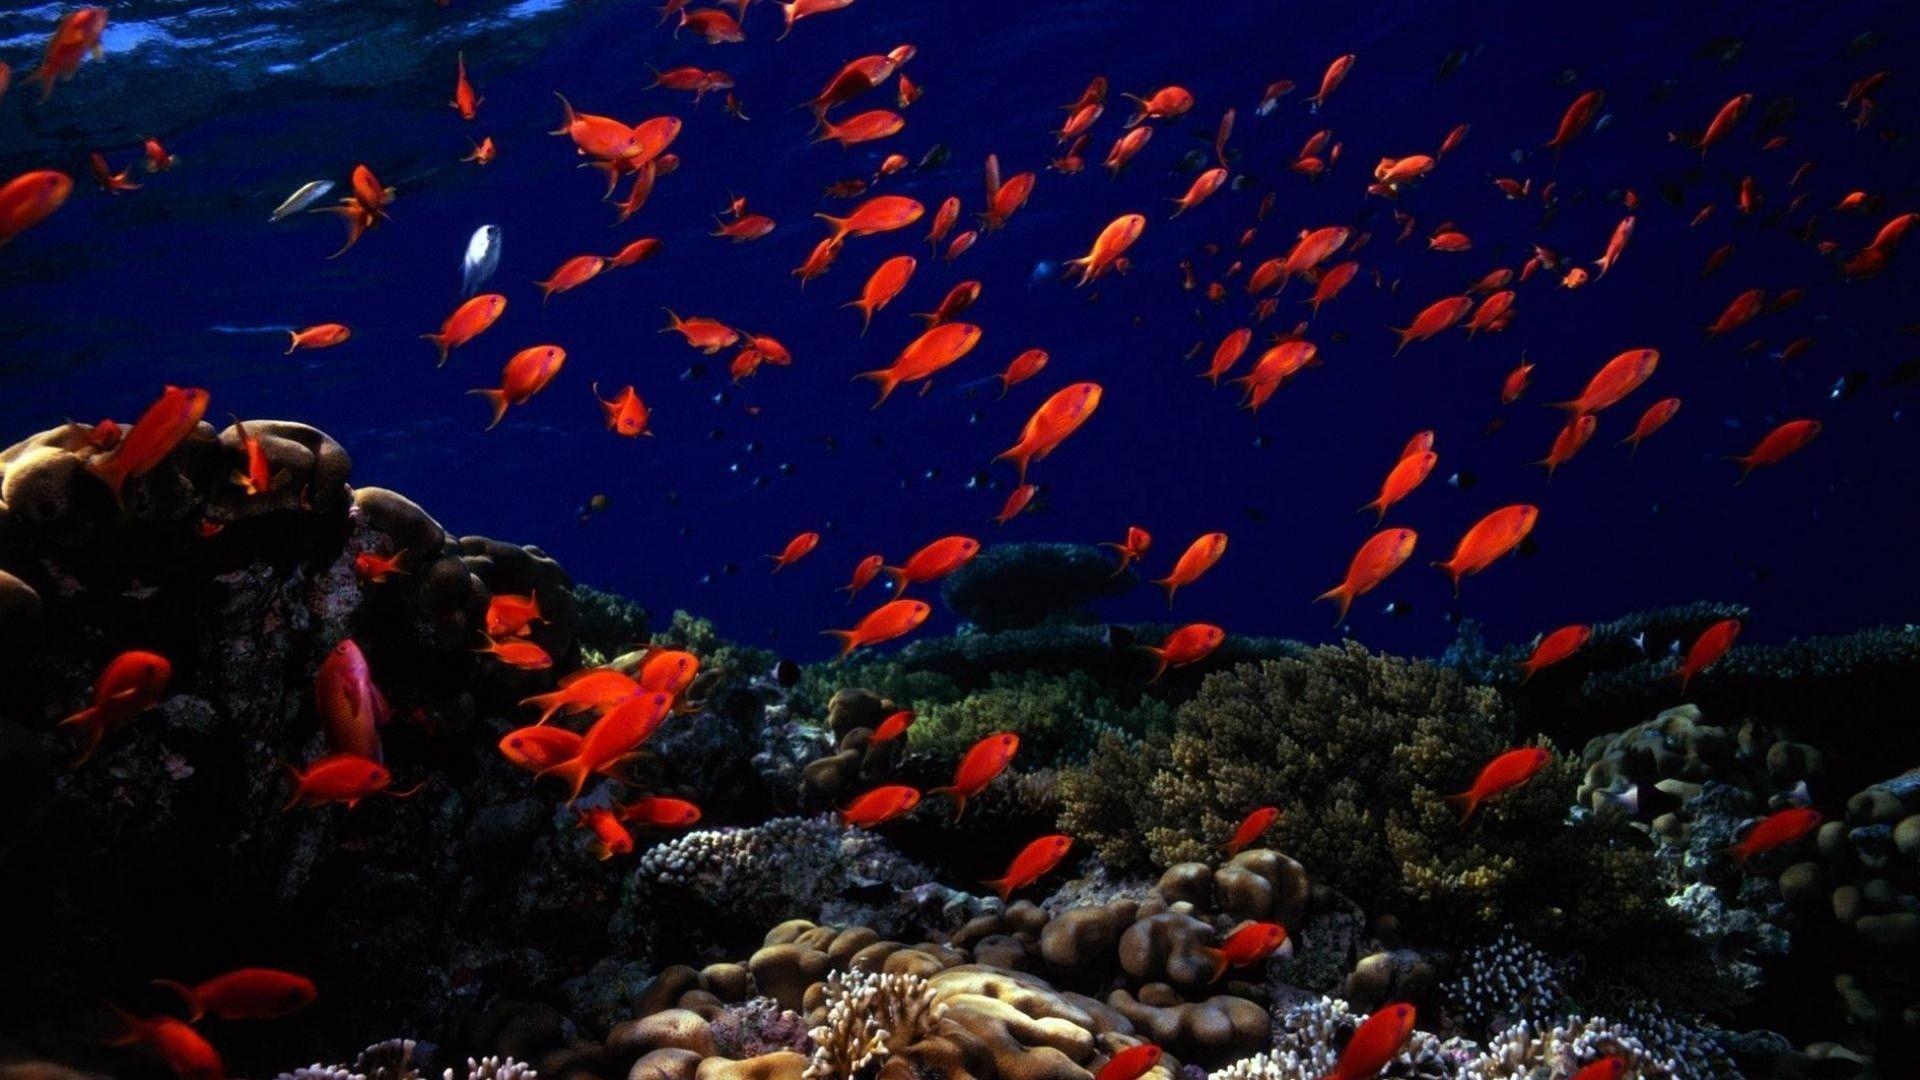 adenan hd wallpaper underwater - photo #20